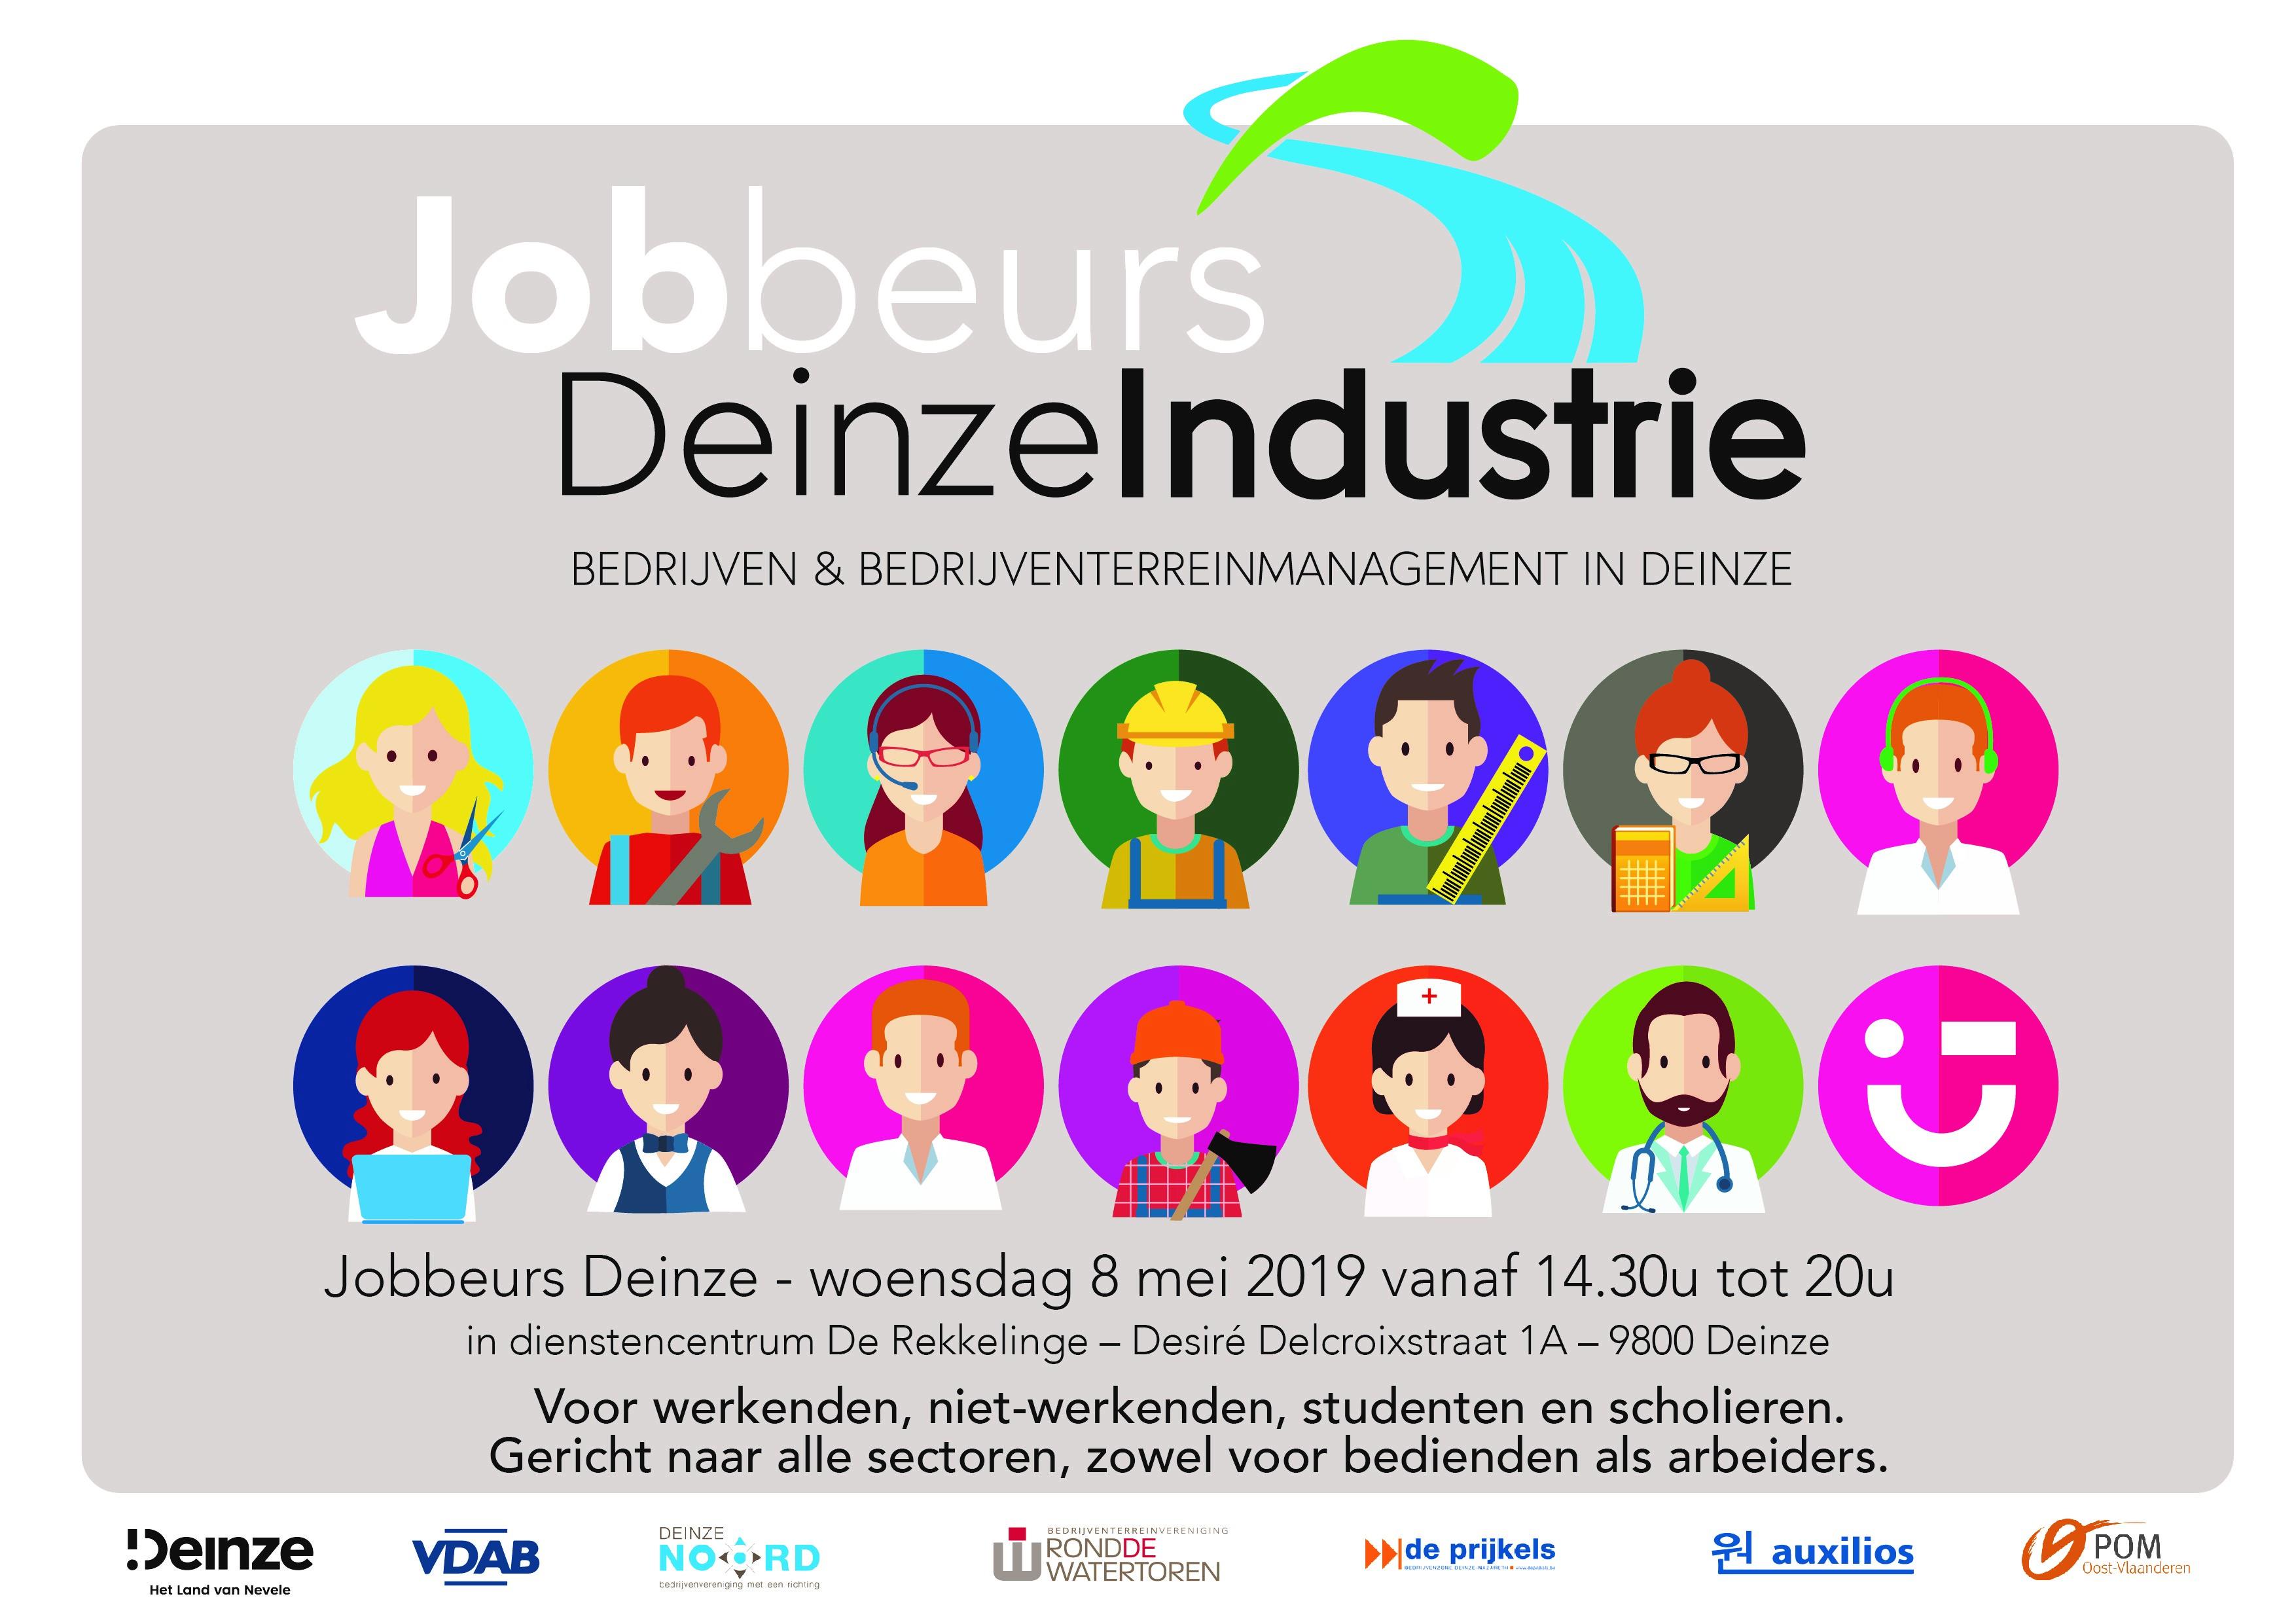 visual_totaal_Deinze_Industrie_Jobbeurs_jpeg.jpg